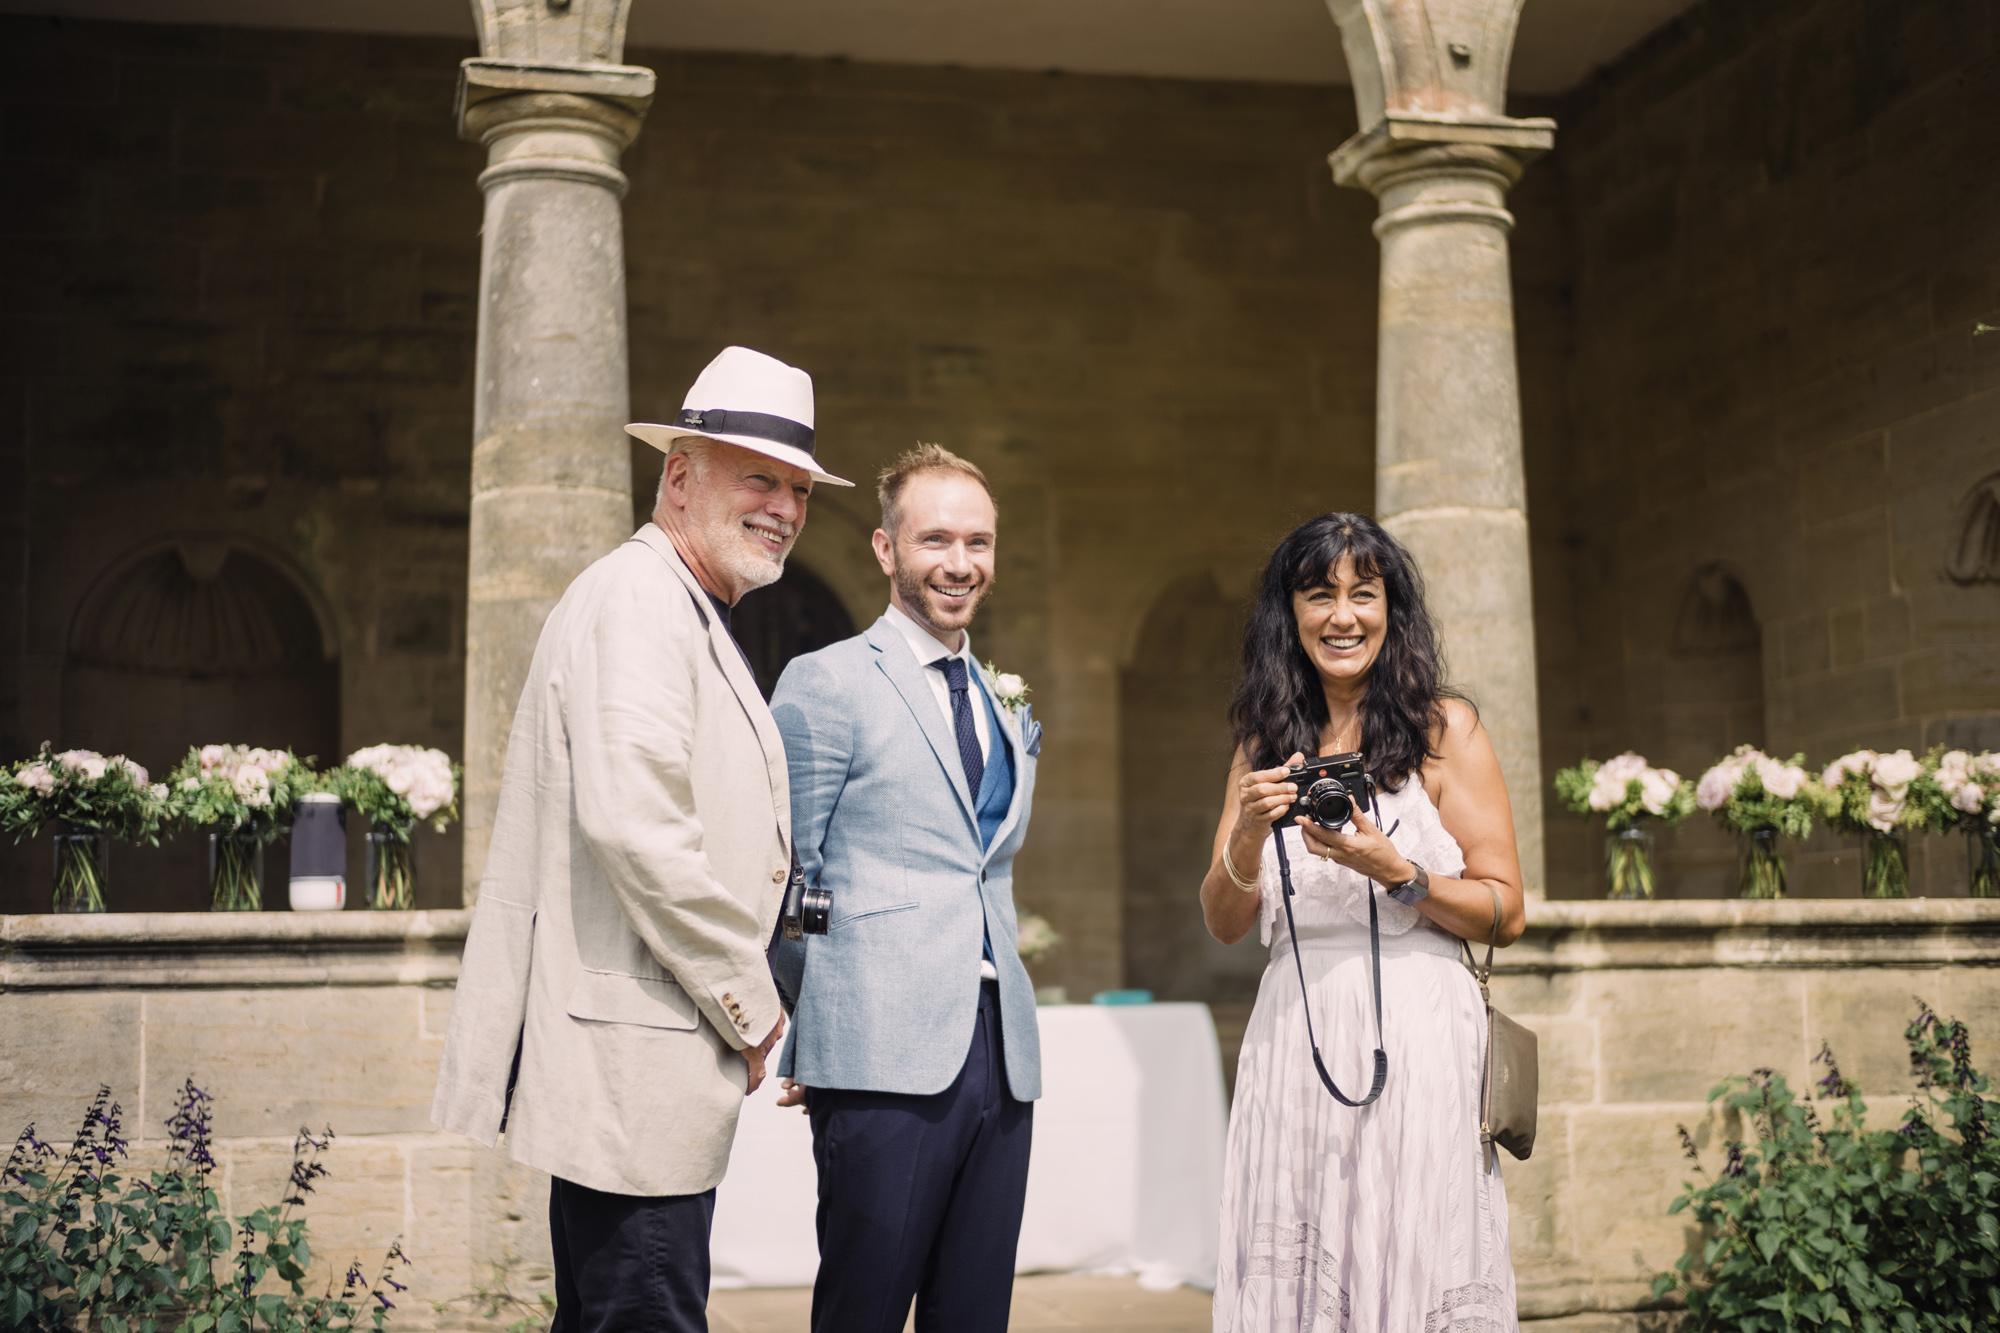 Jaz-Kate-Beaumont-Oyster-Silk-Bias-Cut-Wedding-Gown-Larkspur-Lace-Top-Sussex-Wedding-3.jpg